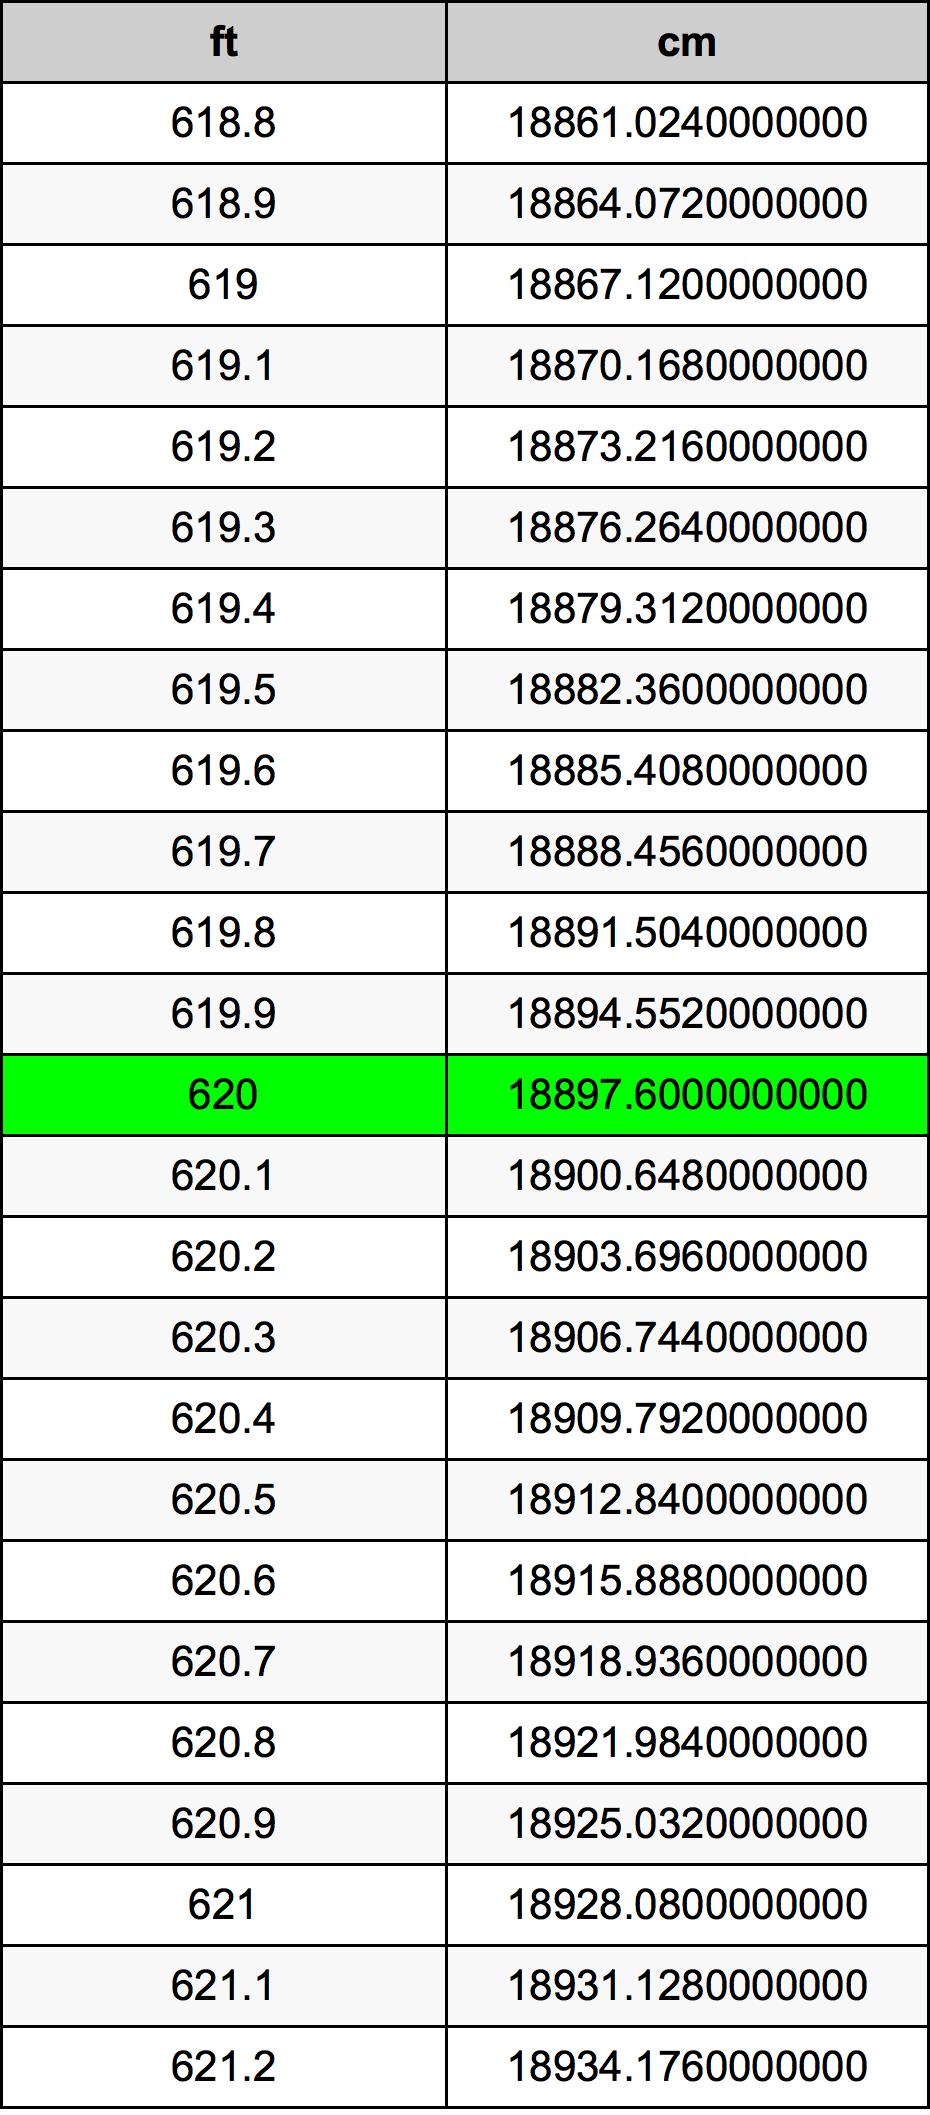 620 Piedi konverżjoni tabella